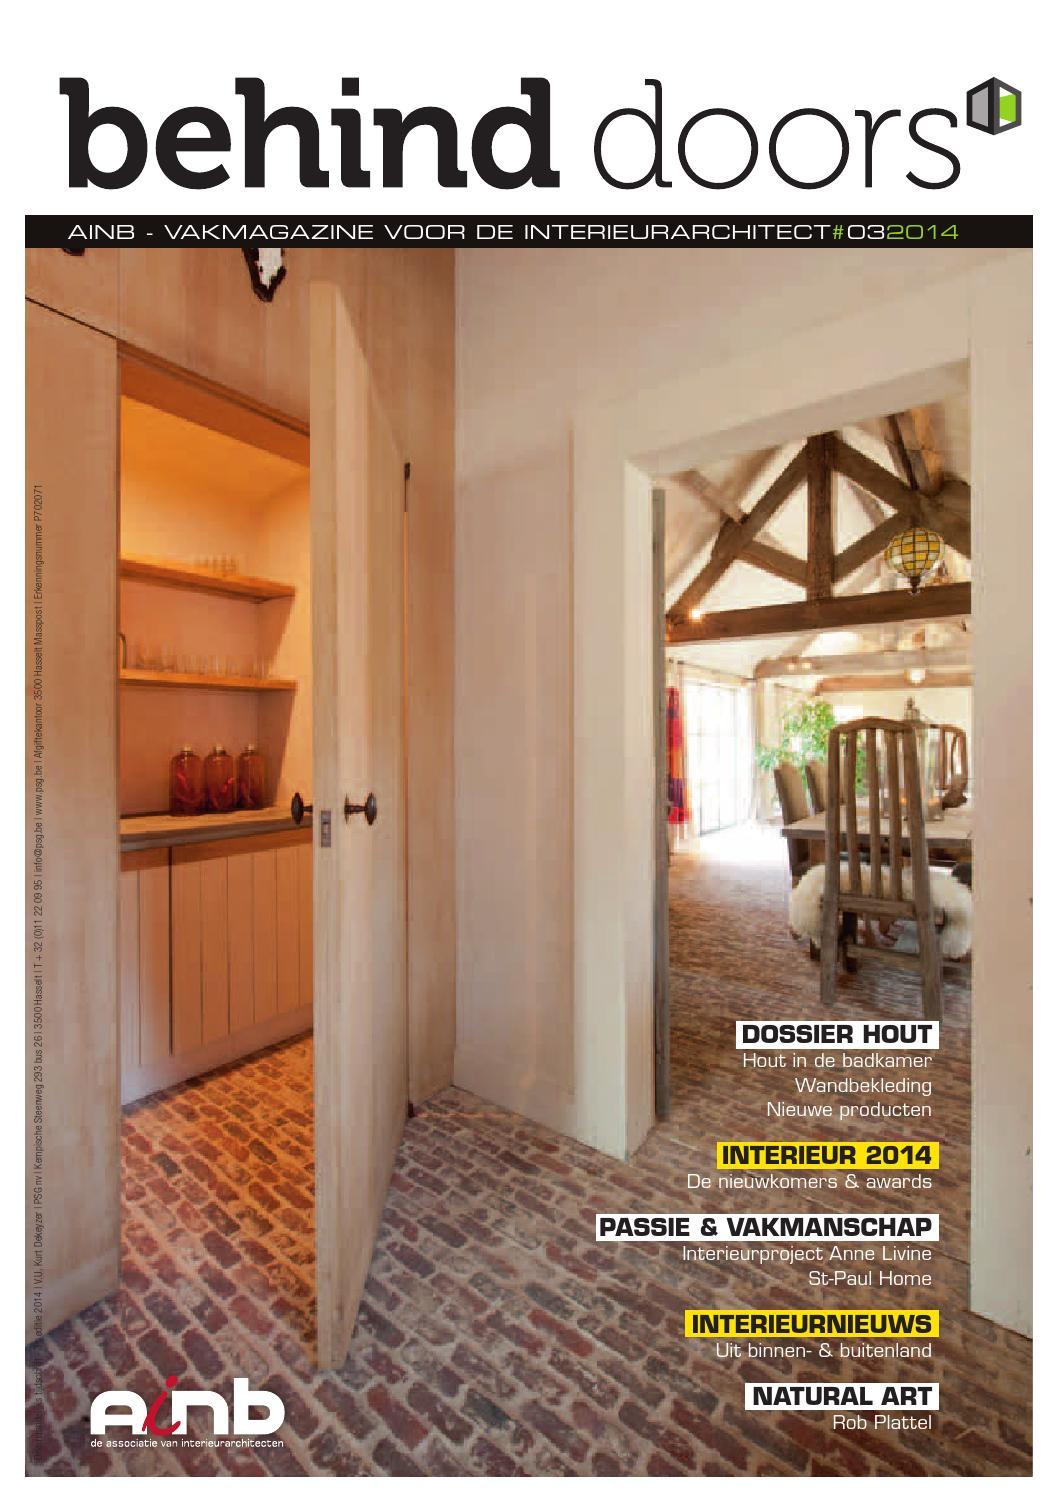 behinddoors03 2014 by ainb issuu